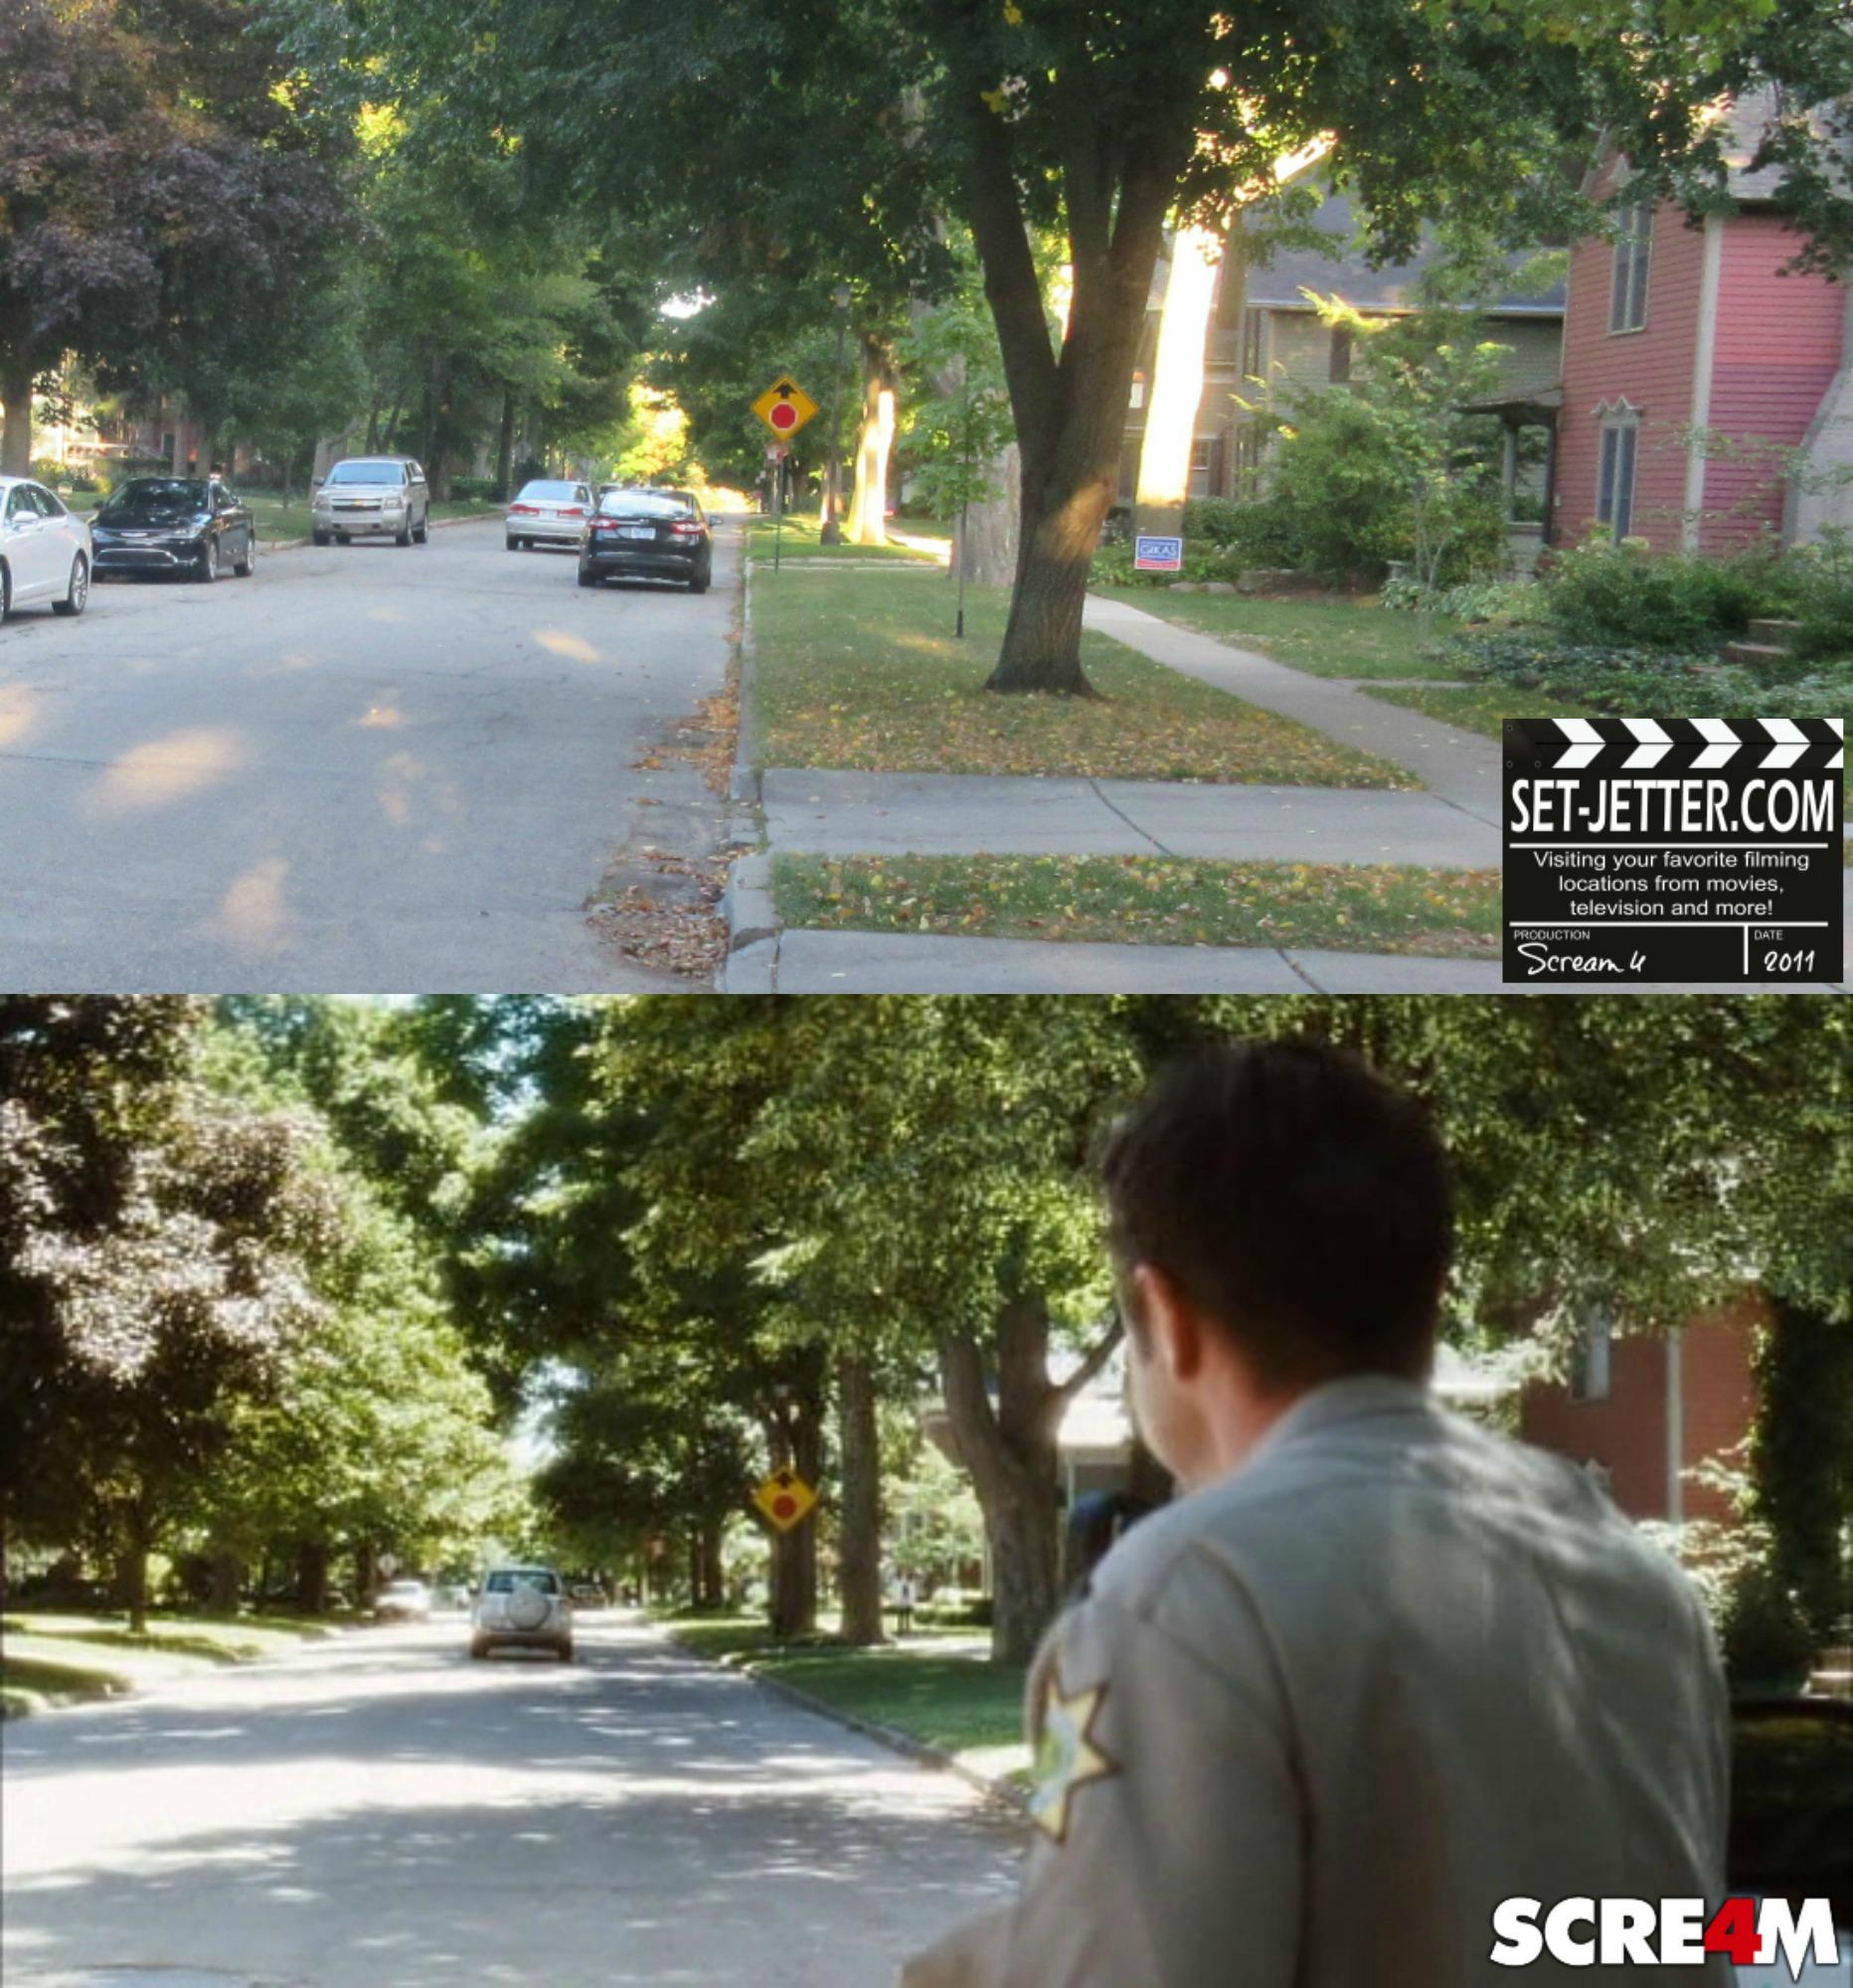 Scream4 comparison 28.jpg